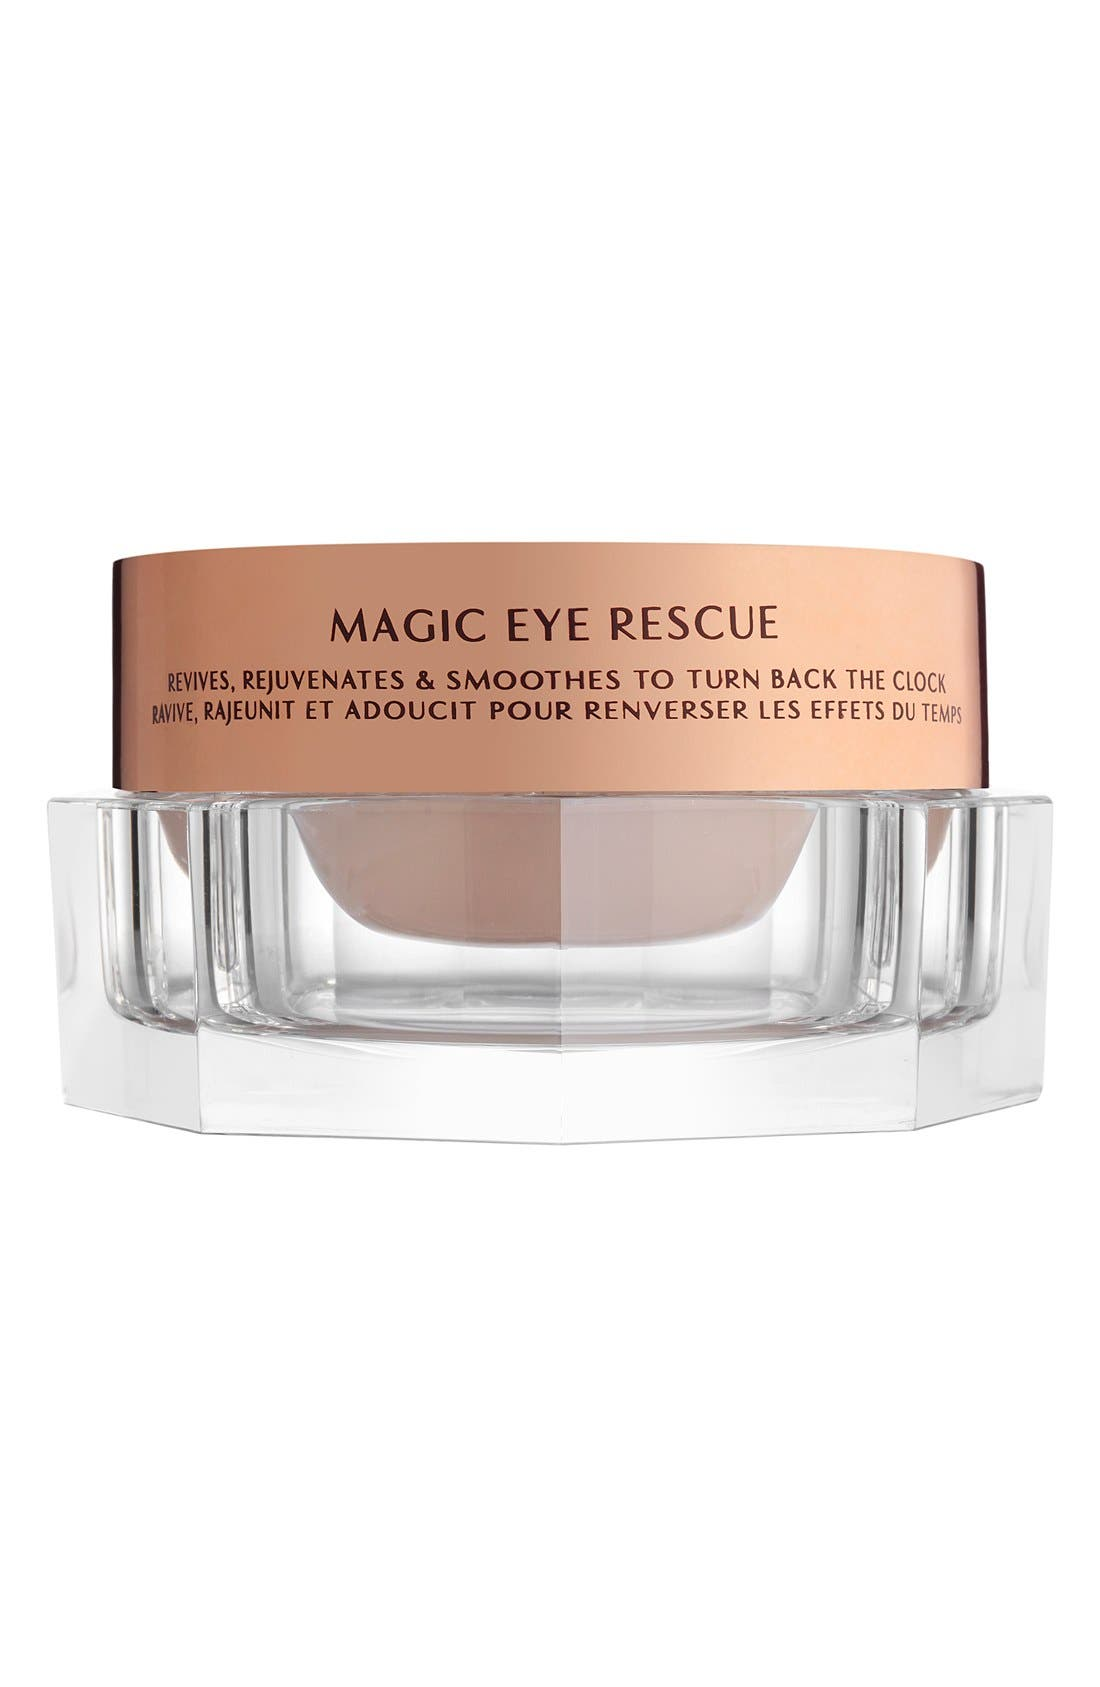 Charlotte Tilbury 'Magic Eye Rescue' Rejuvenates, Smoothes & Repairs